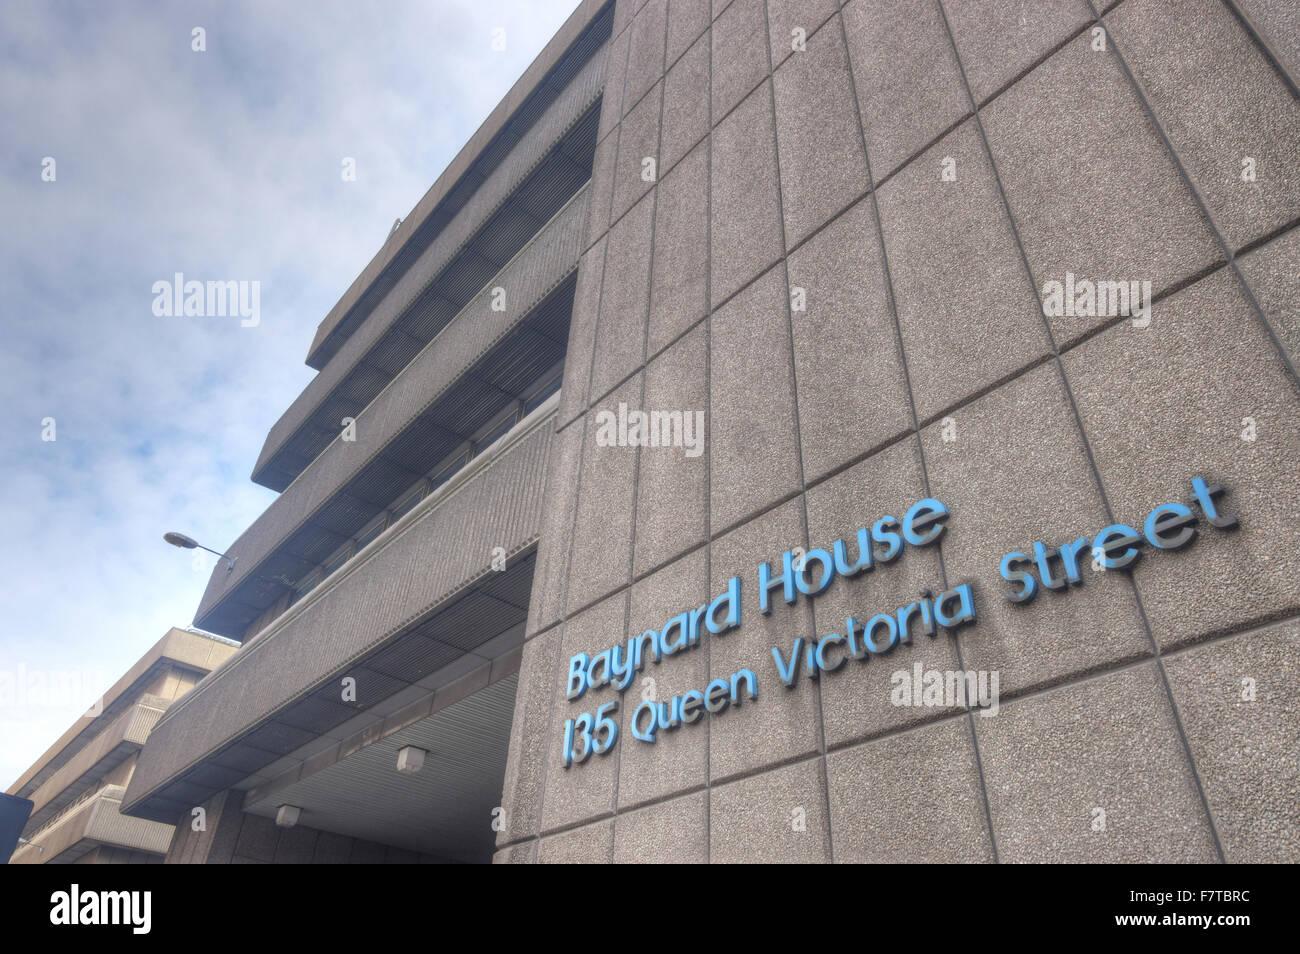 Baynard House,  concrete building,  70s architecture - Stock Image